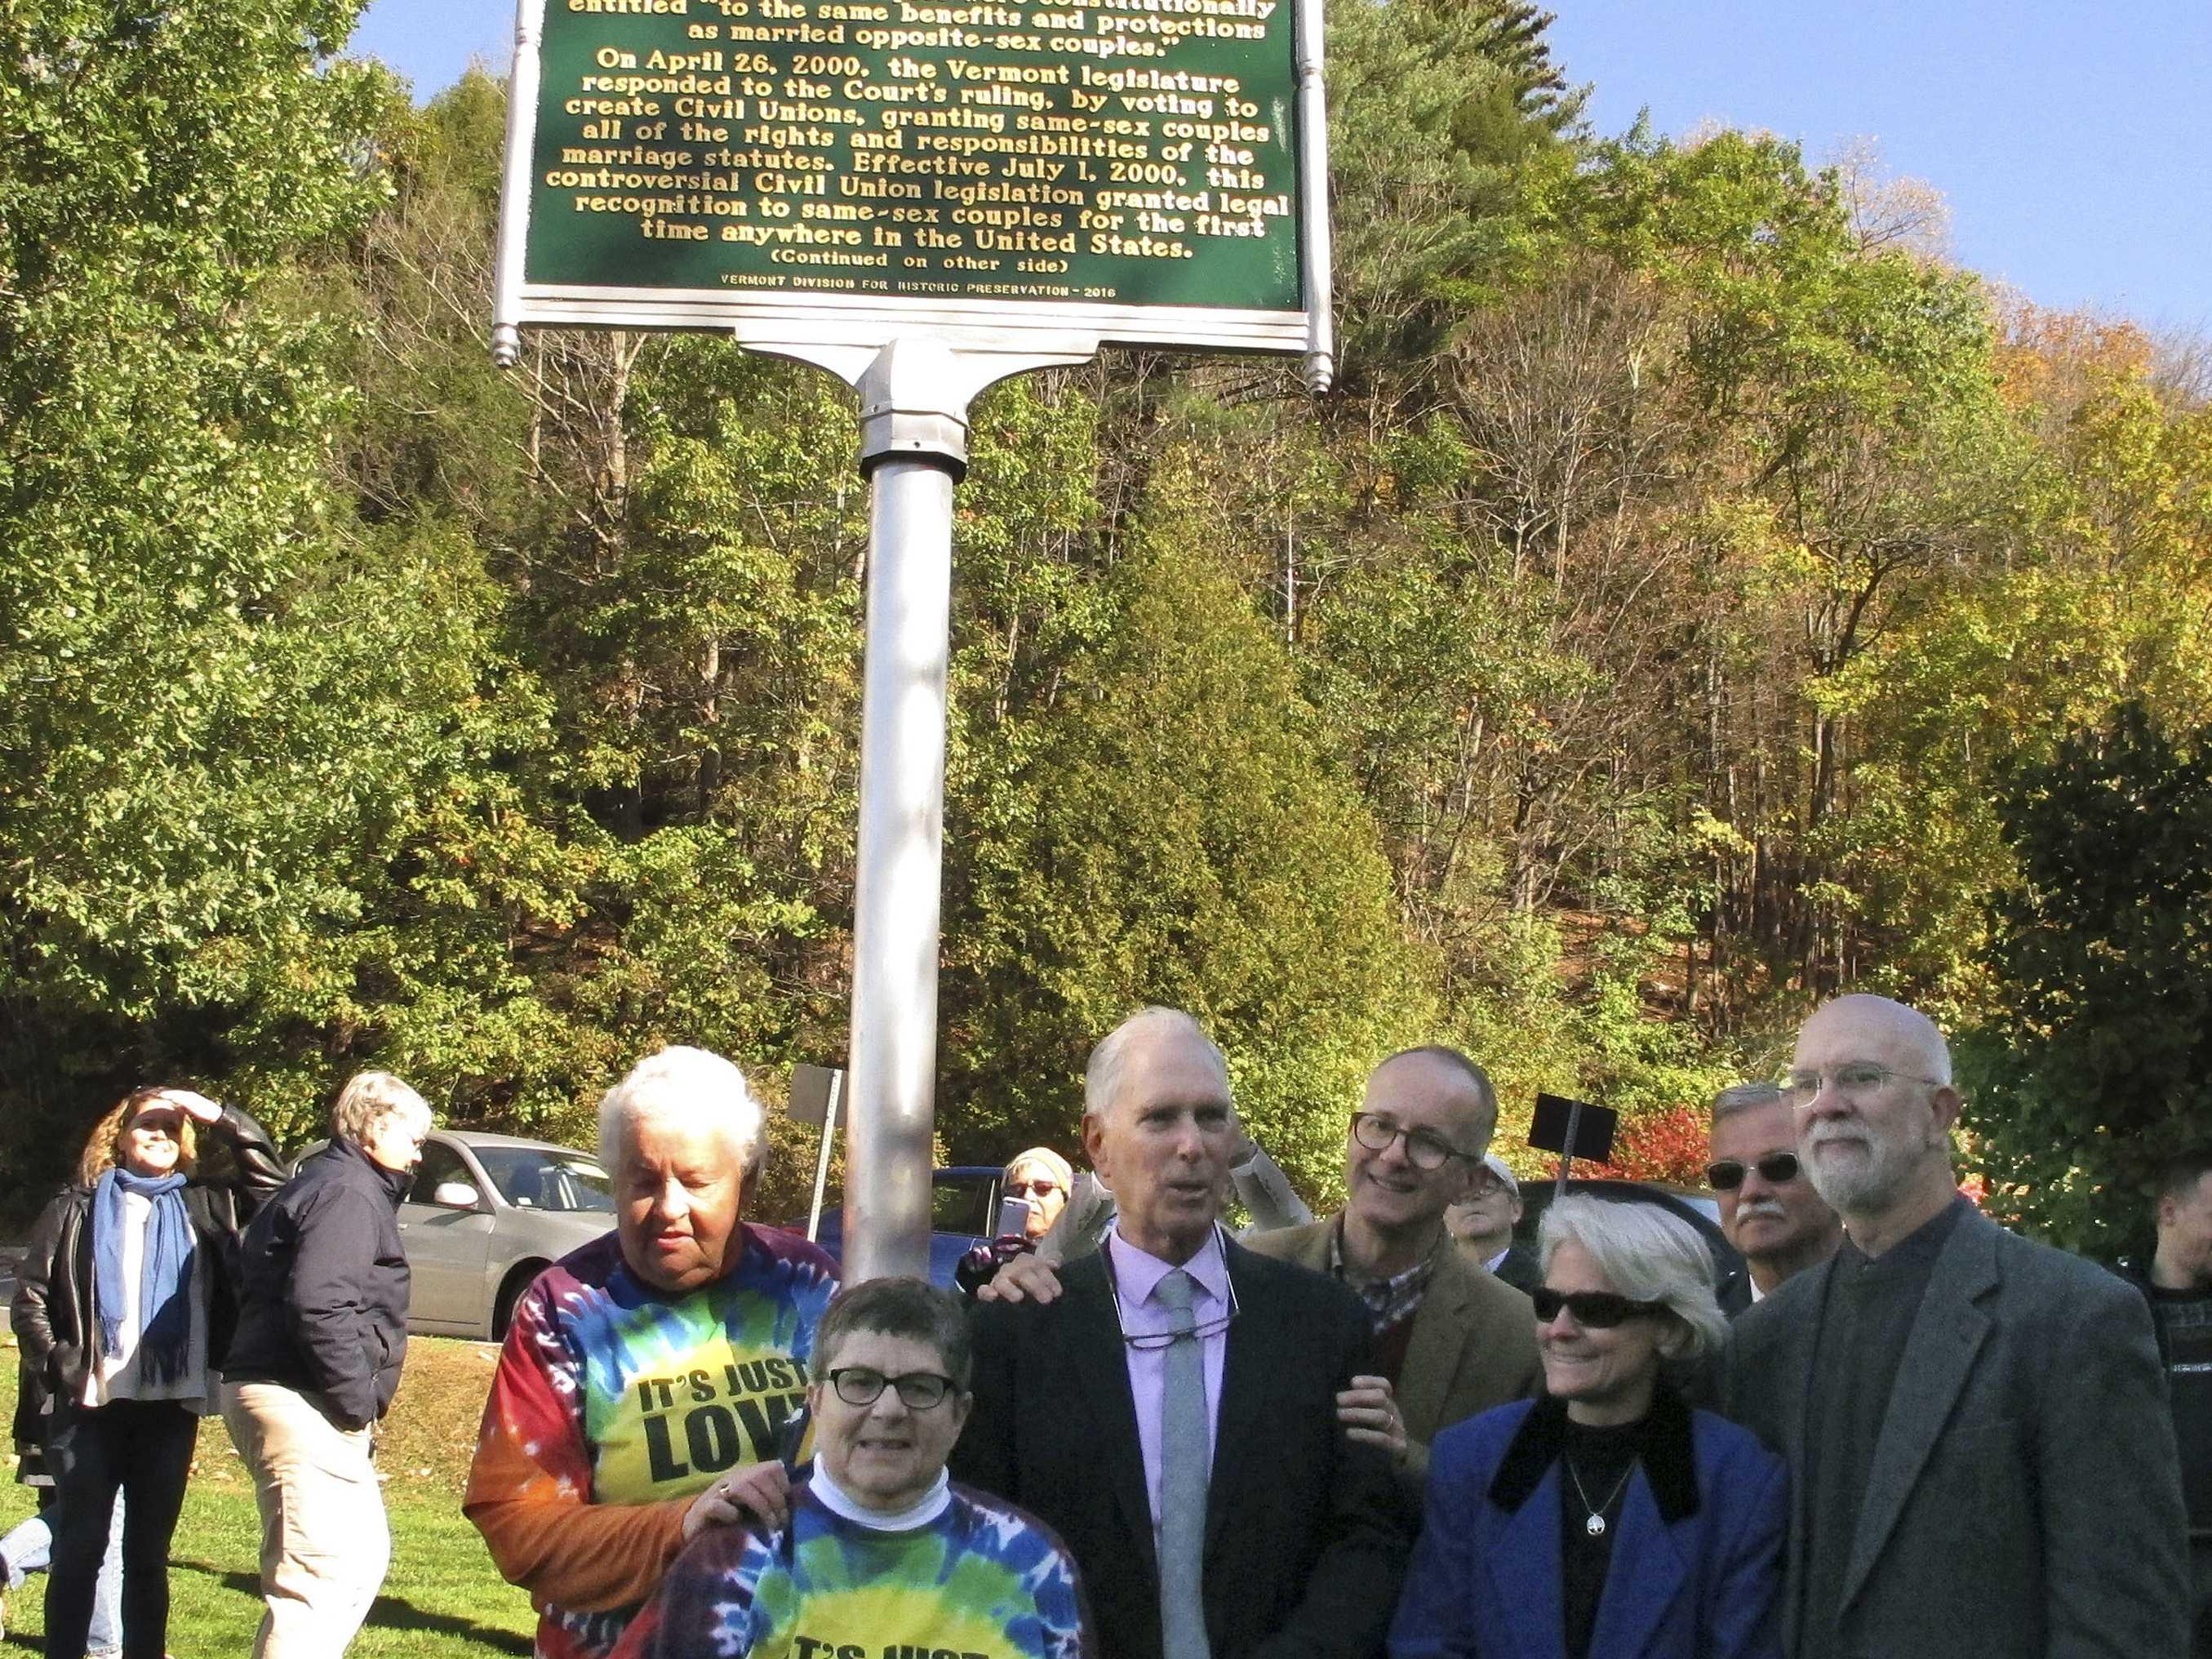 Vermont Commemorates Civil Unions with Historic Site Marker